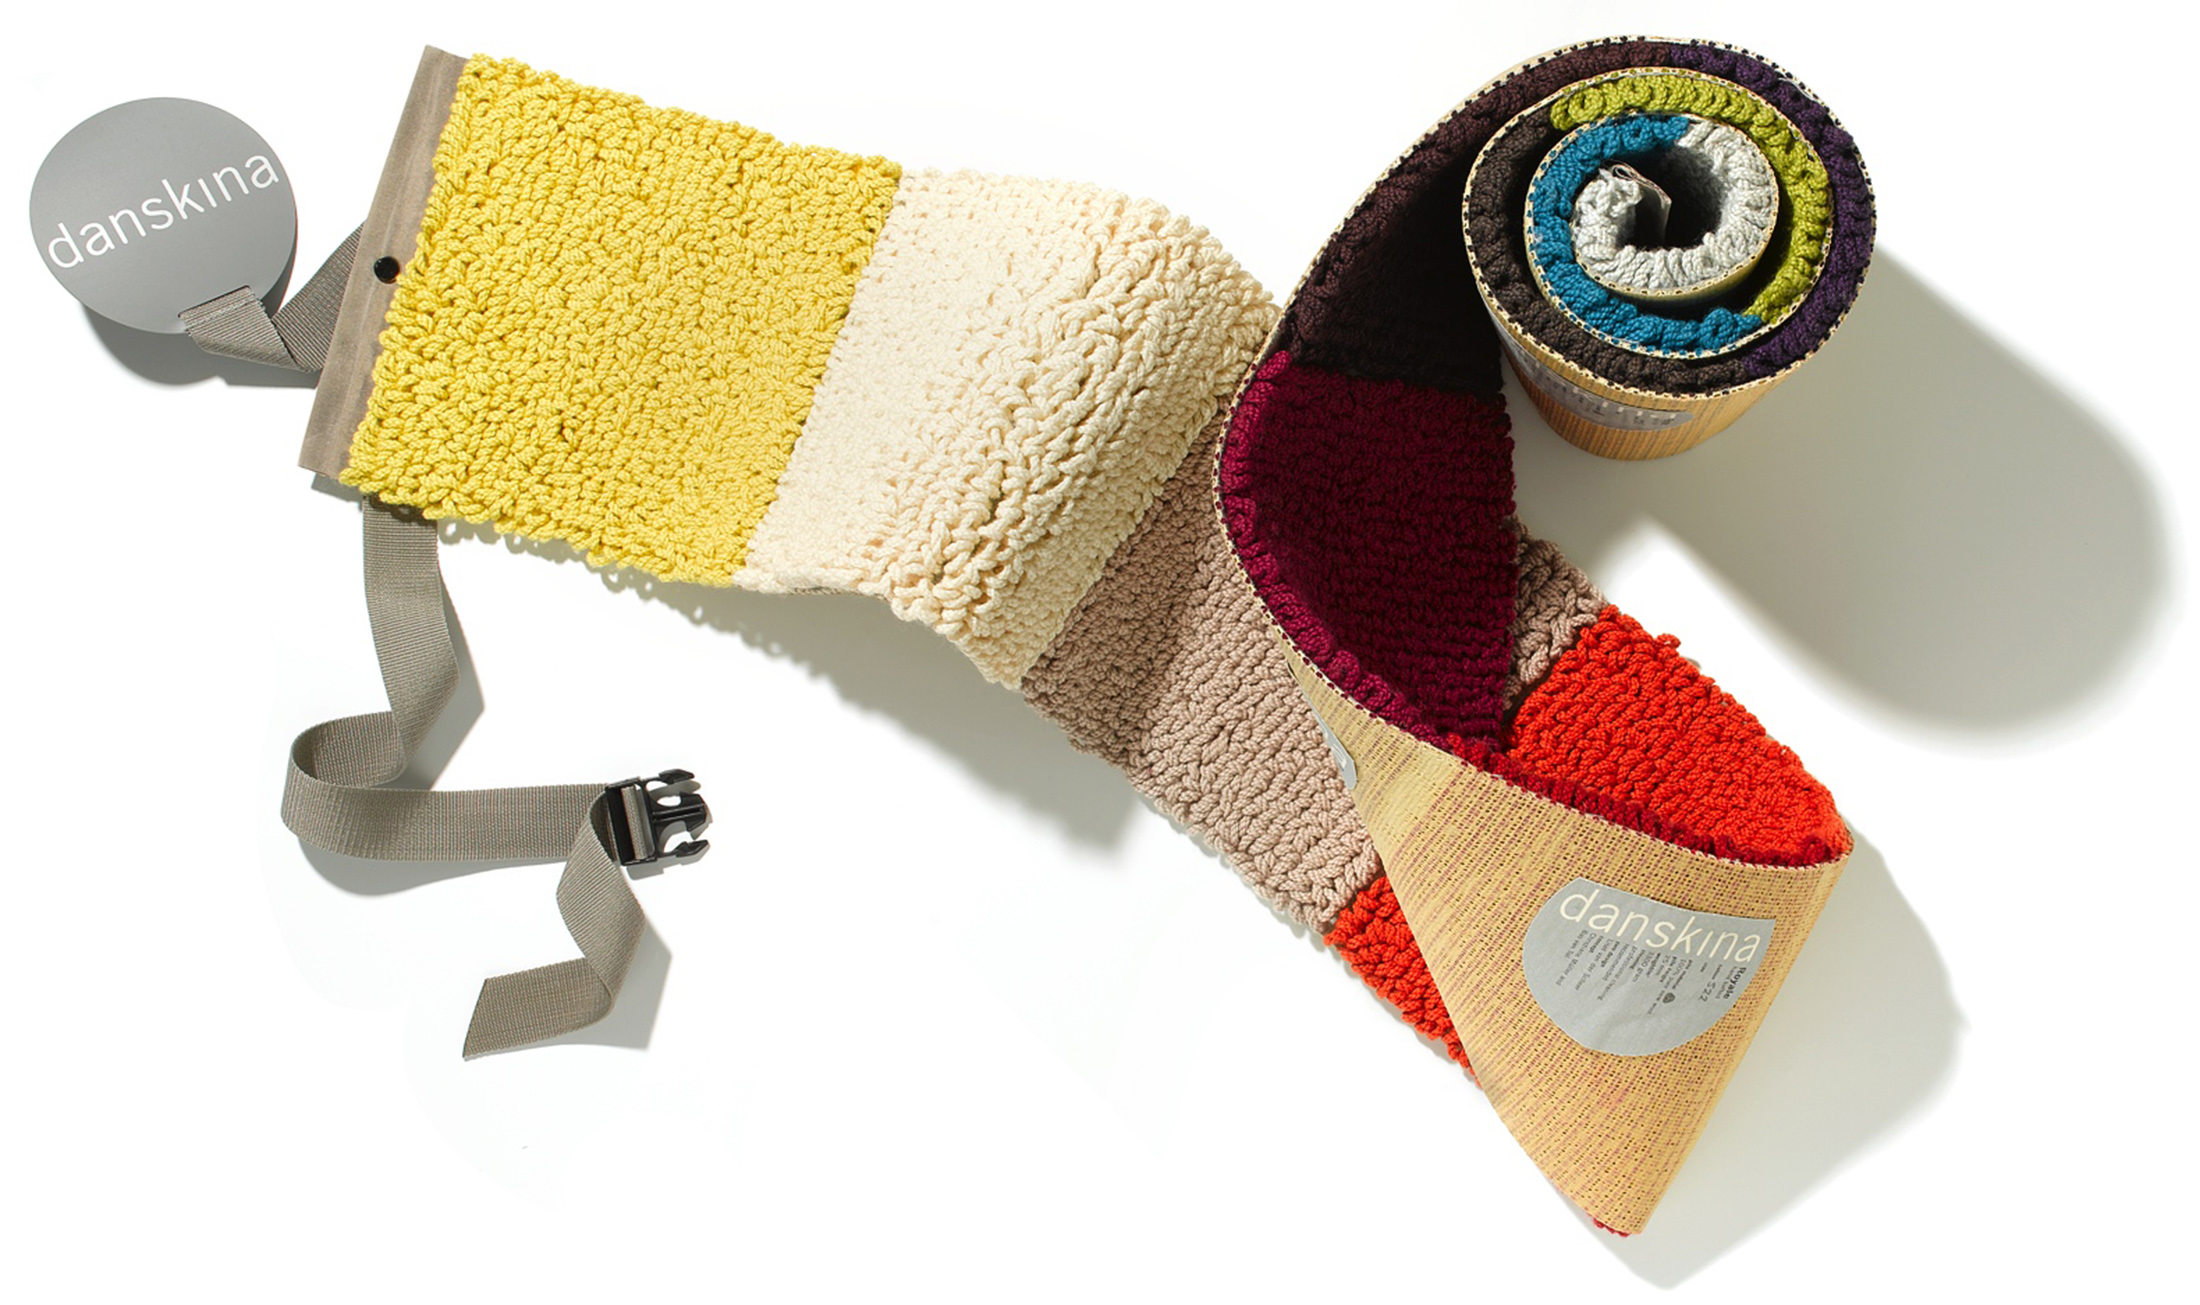 royale own yarn development with spinning mill de wijs danskina. Black Bedroom Furniture Sets. Home Design Ideas